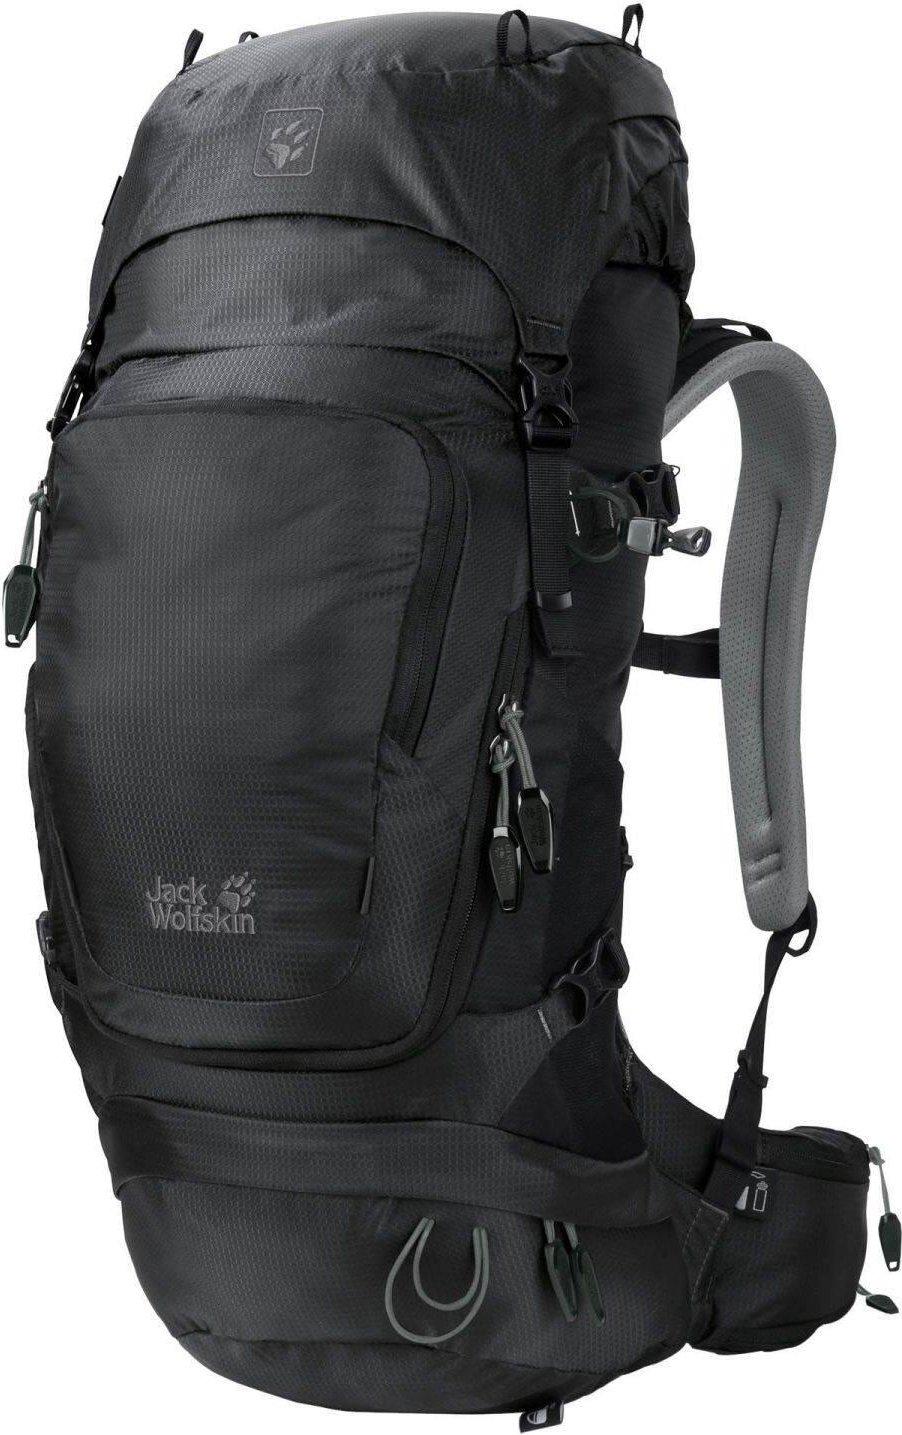 Jack Wolfskin Orbit 26 Pack Rucksack (Farbe: 6350 phantom)